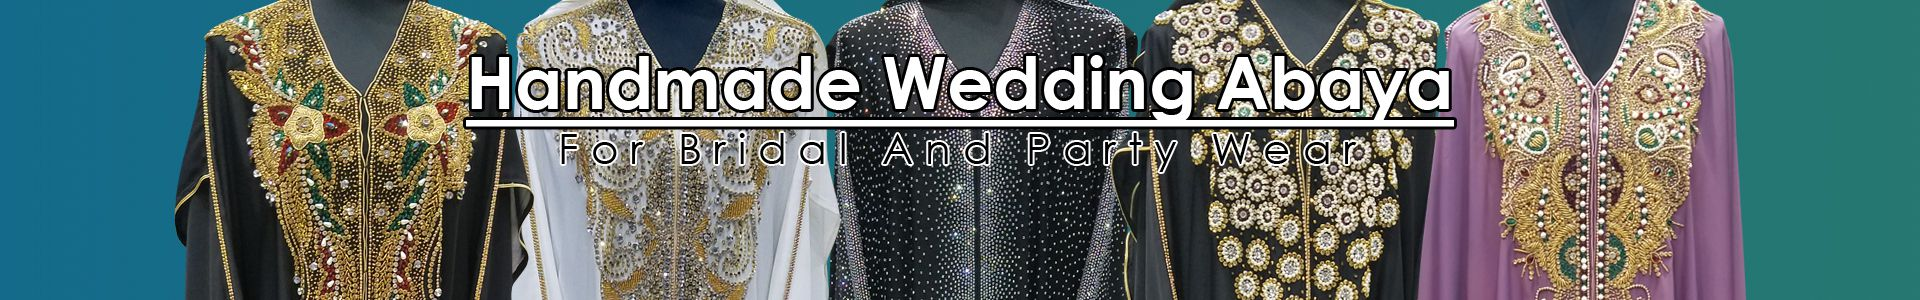 Party & Wedding Abaya